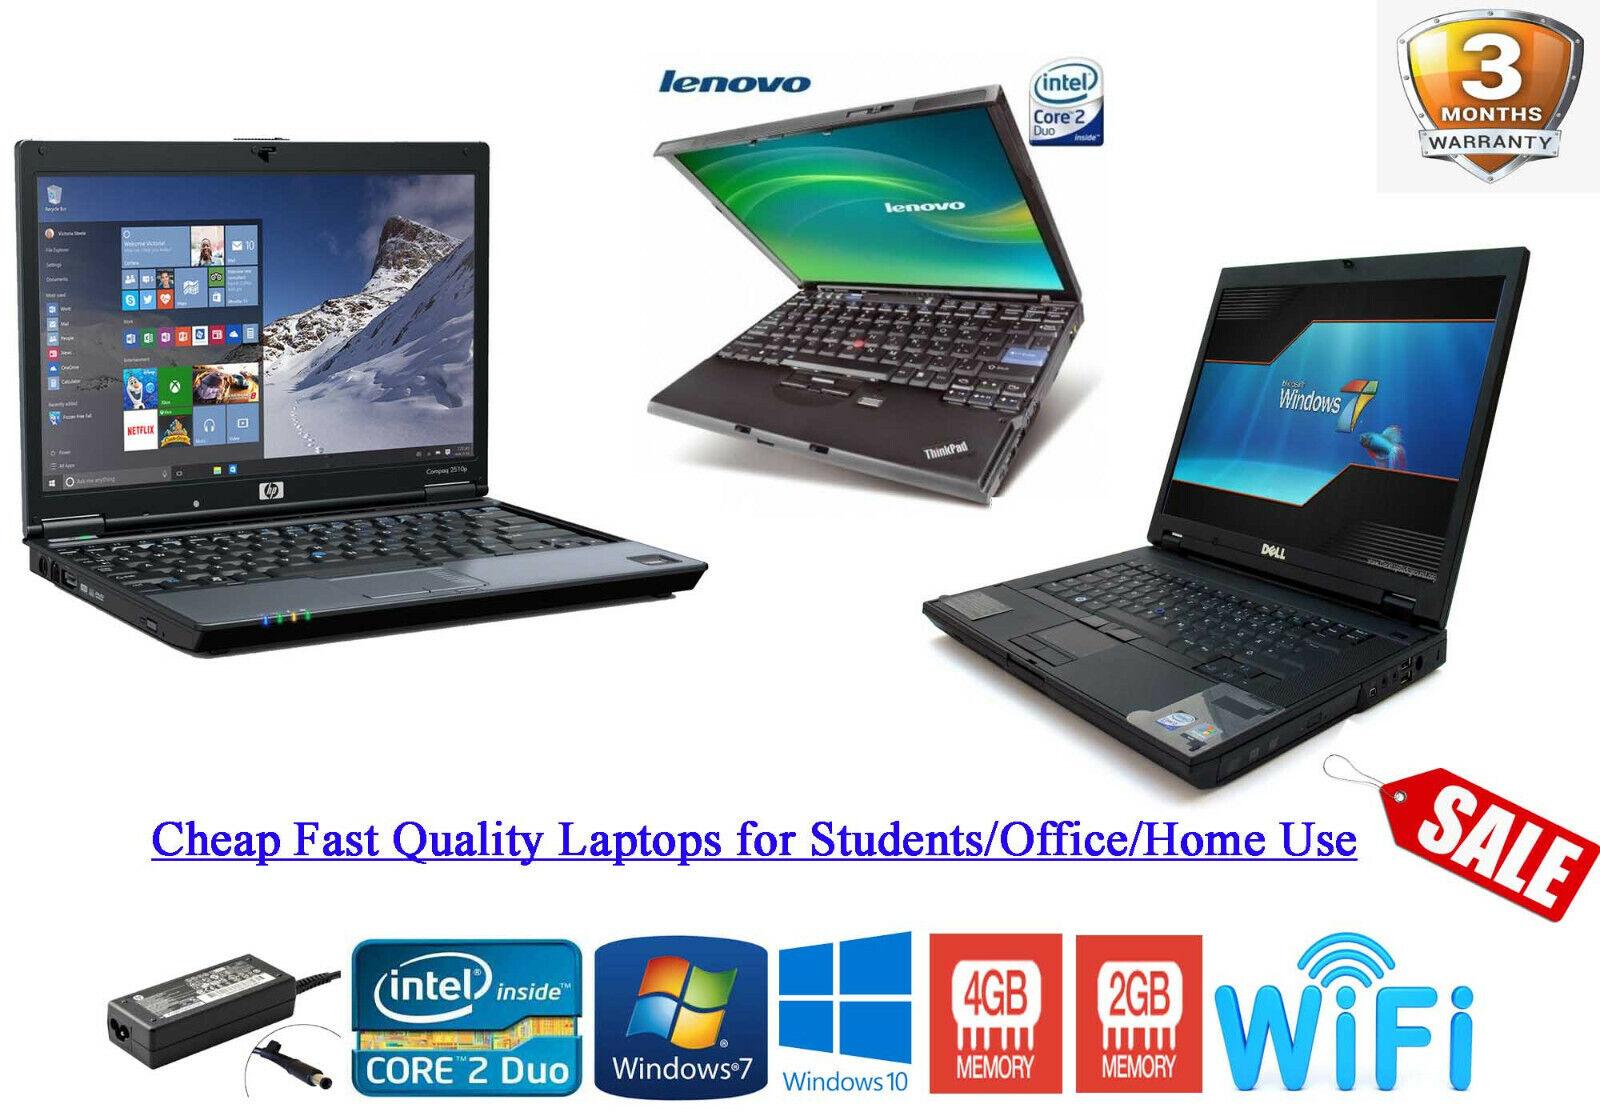 Laptop Windows - Cheap Fast Windows 10 LAPTOP i5 i3 Core 2 Duo 320GB 4GB RAM WIFI WARRANTY